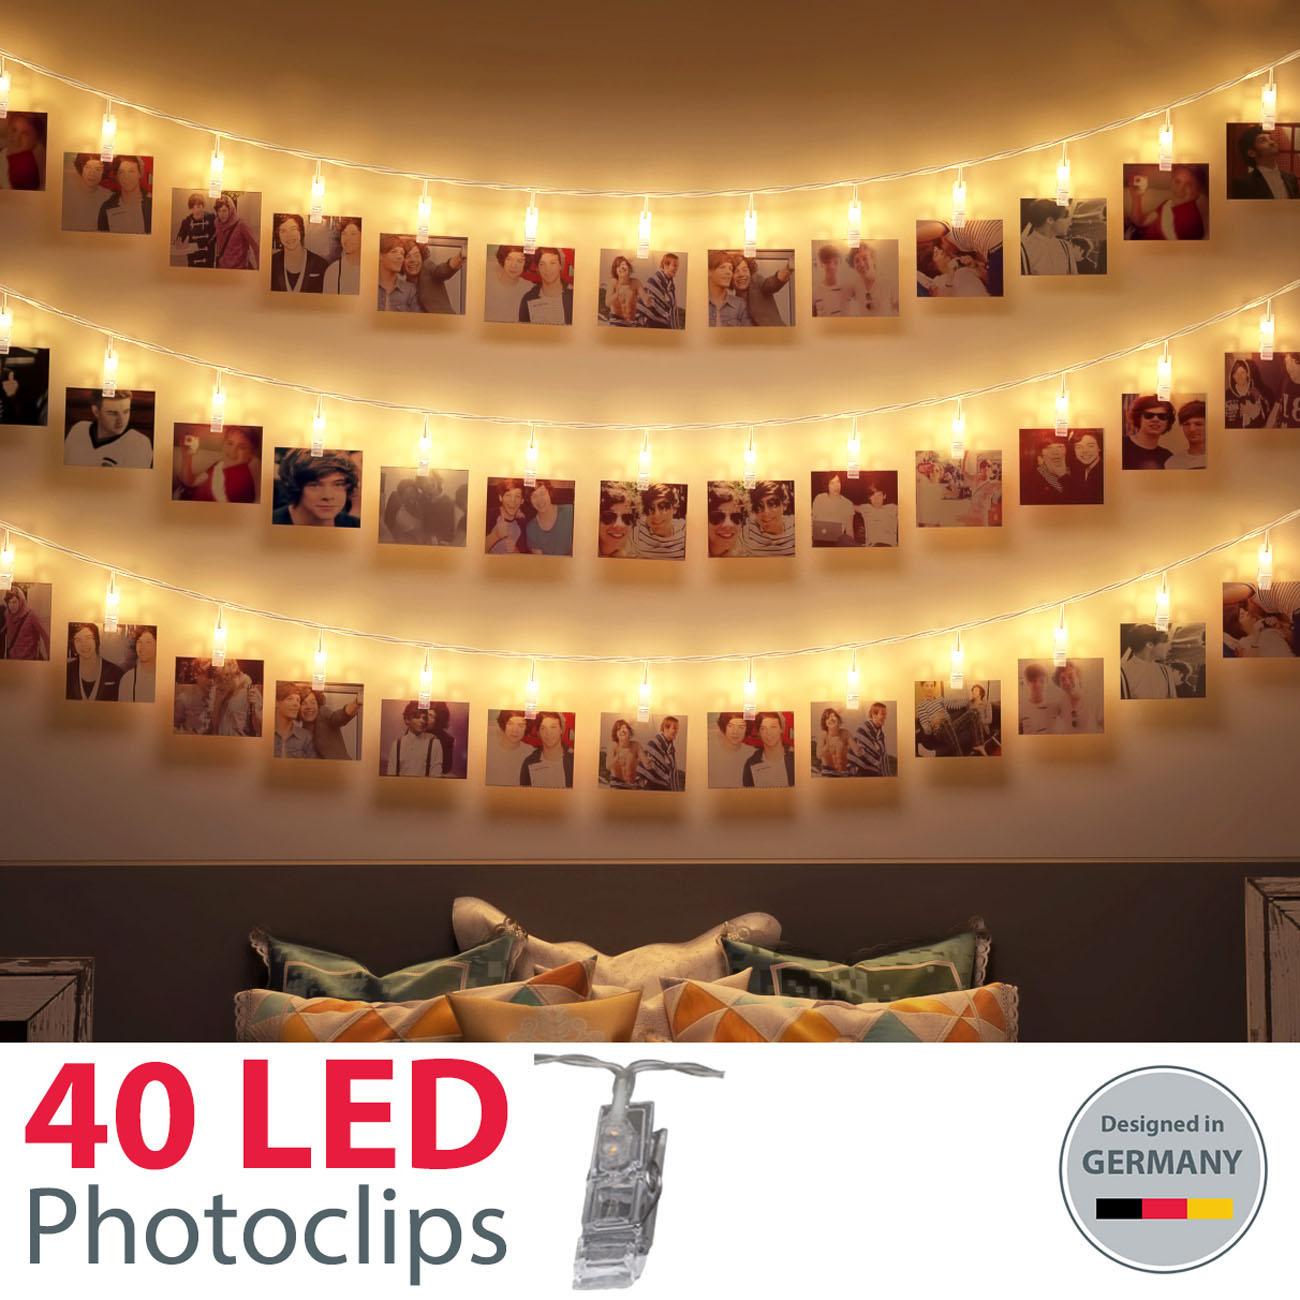 LED Fotolichterkette mit 40 Foto Clips 5m - 3